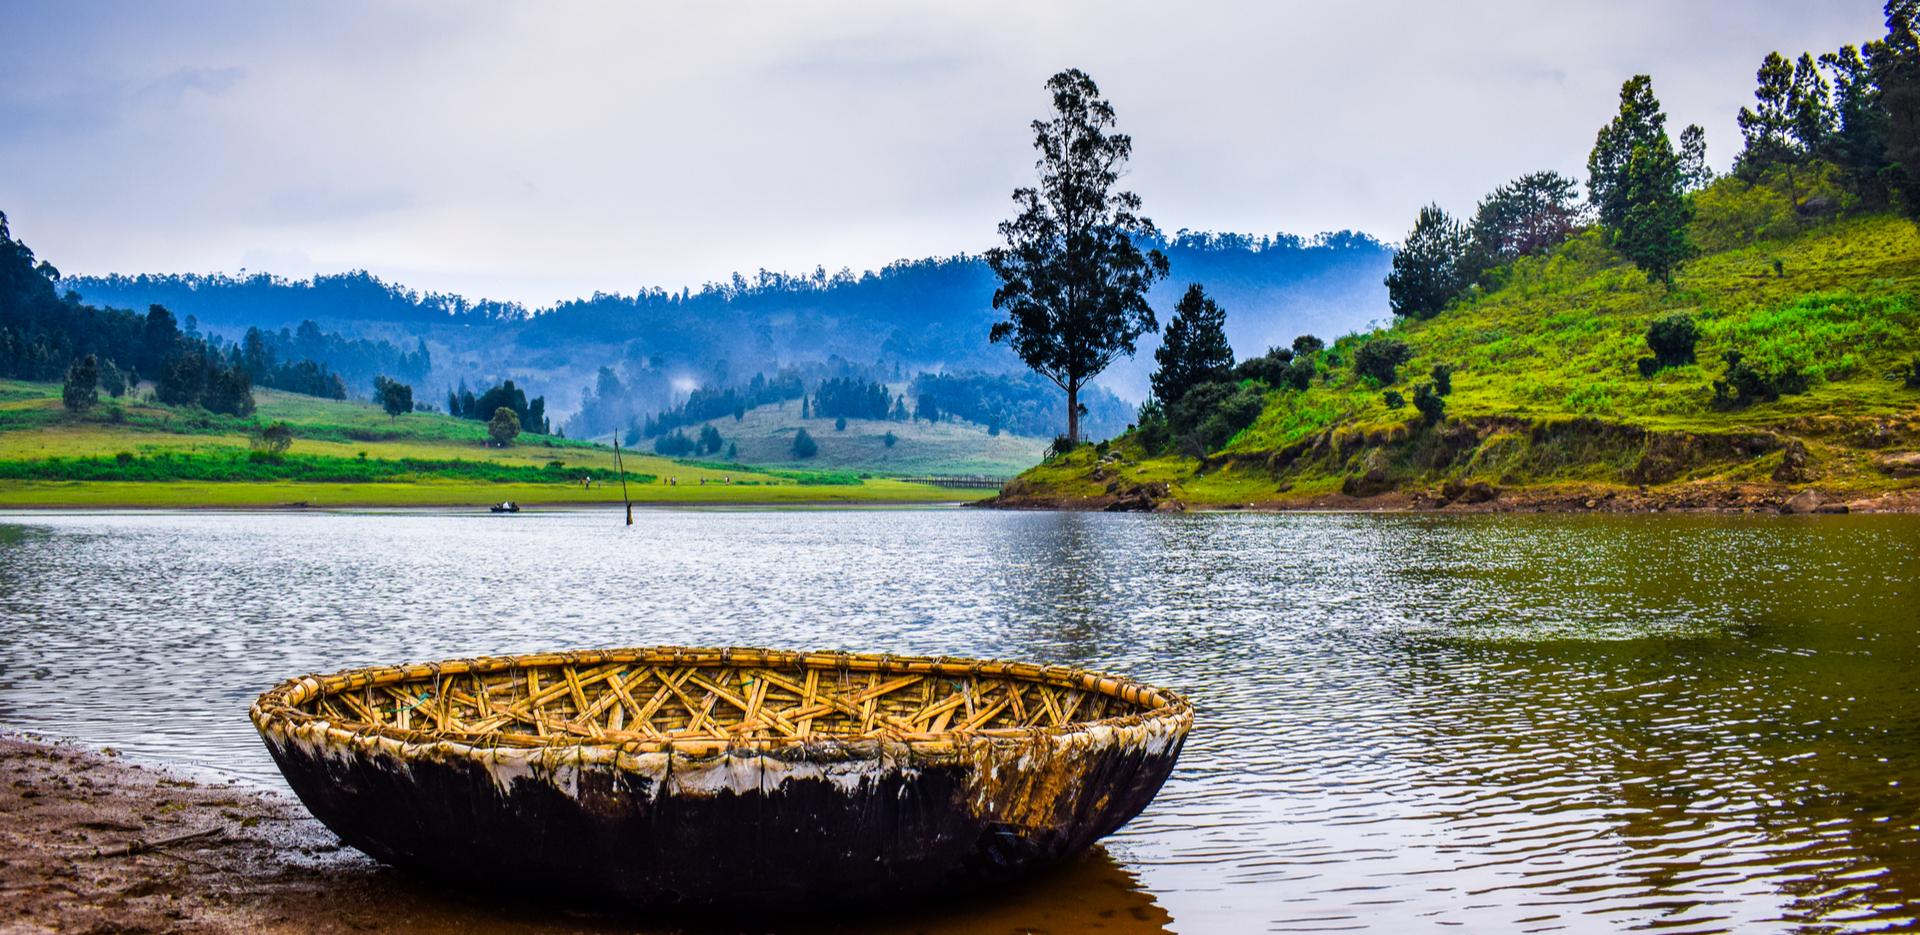 A coracle on a lake in Kodaikanal